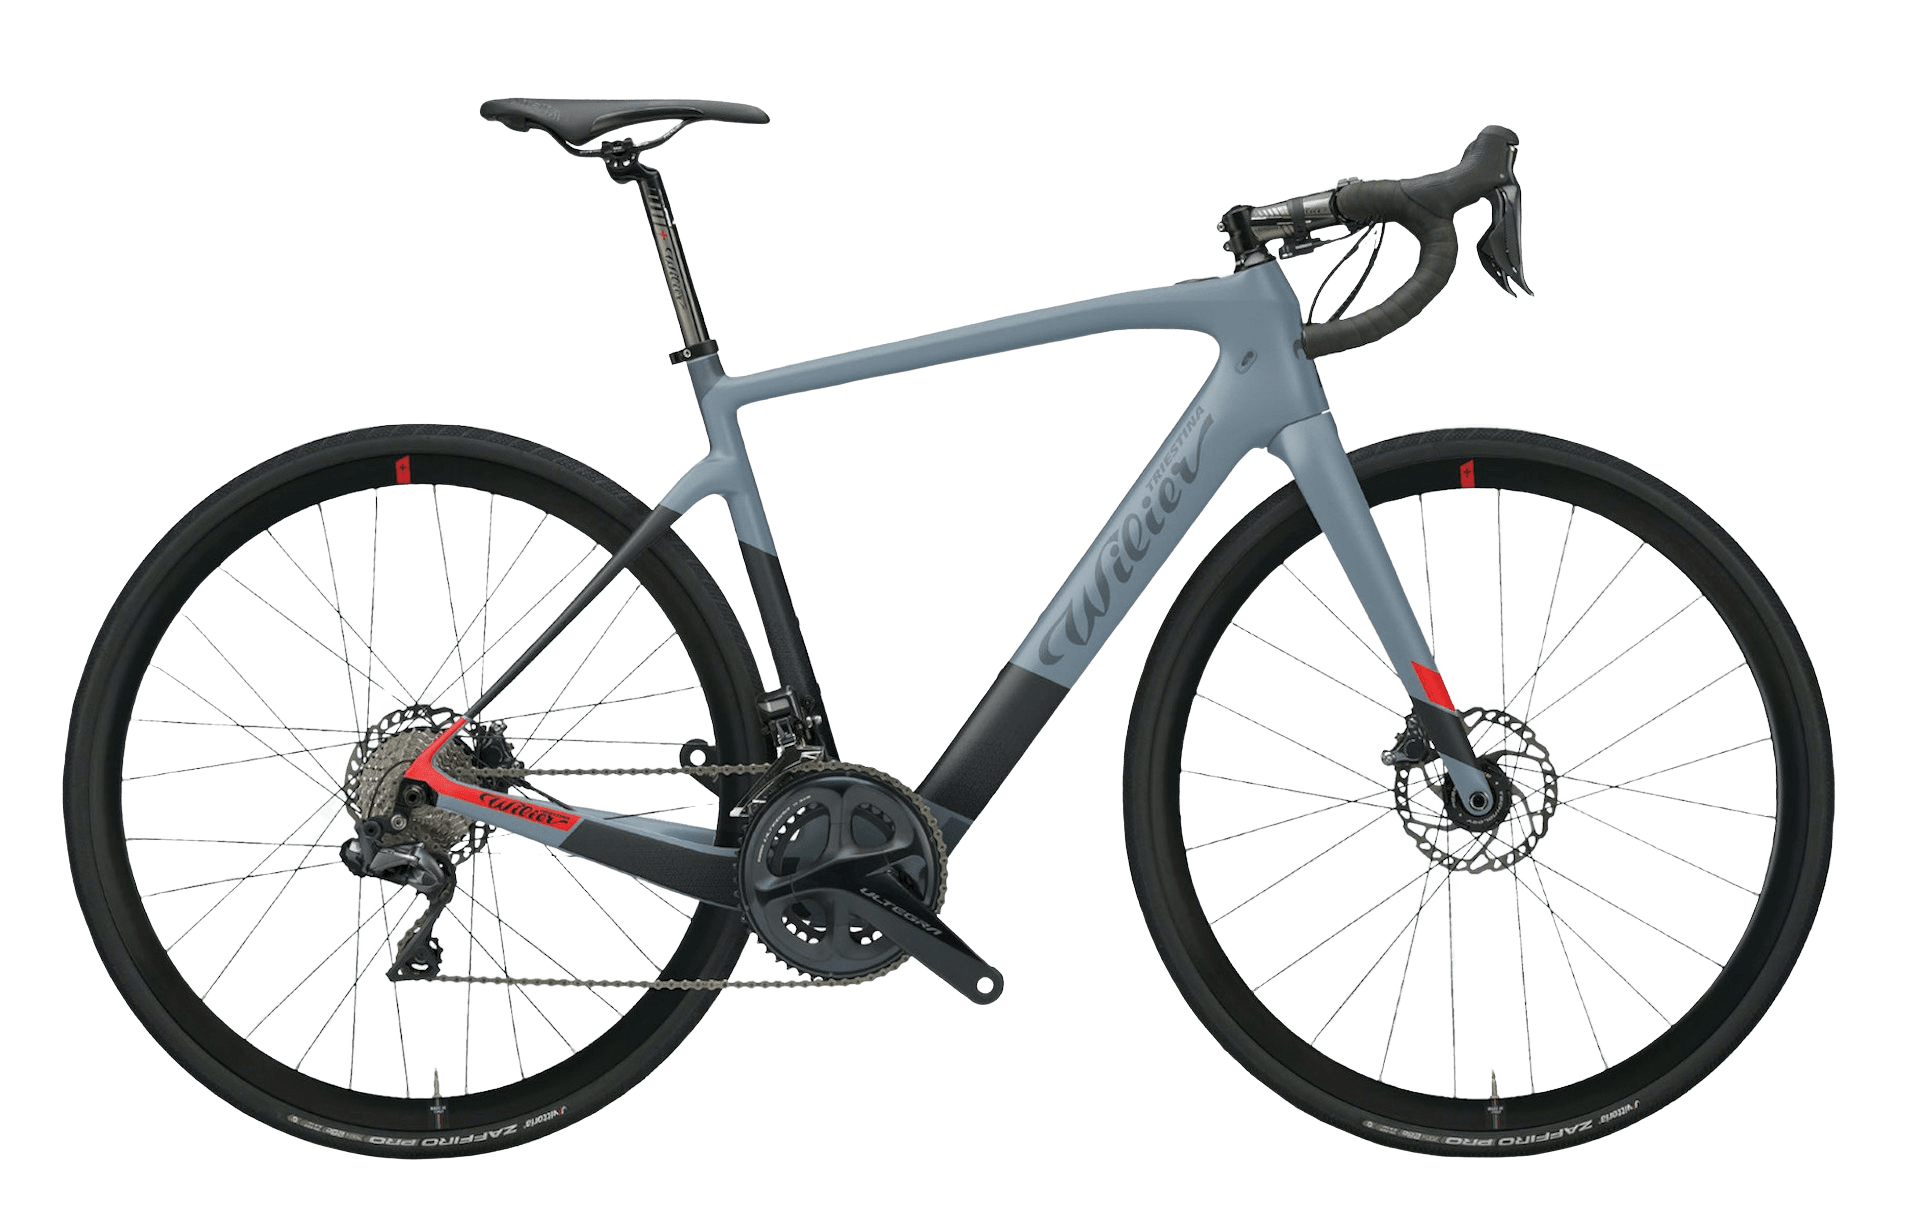 wilier cento 1 hybrid e-bike racefiets